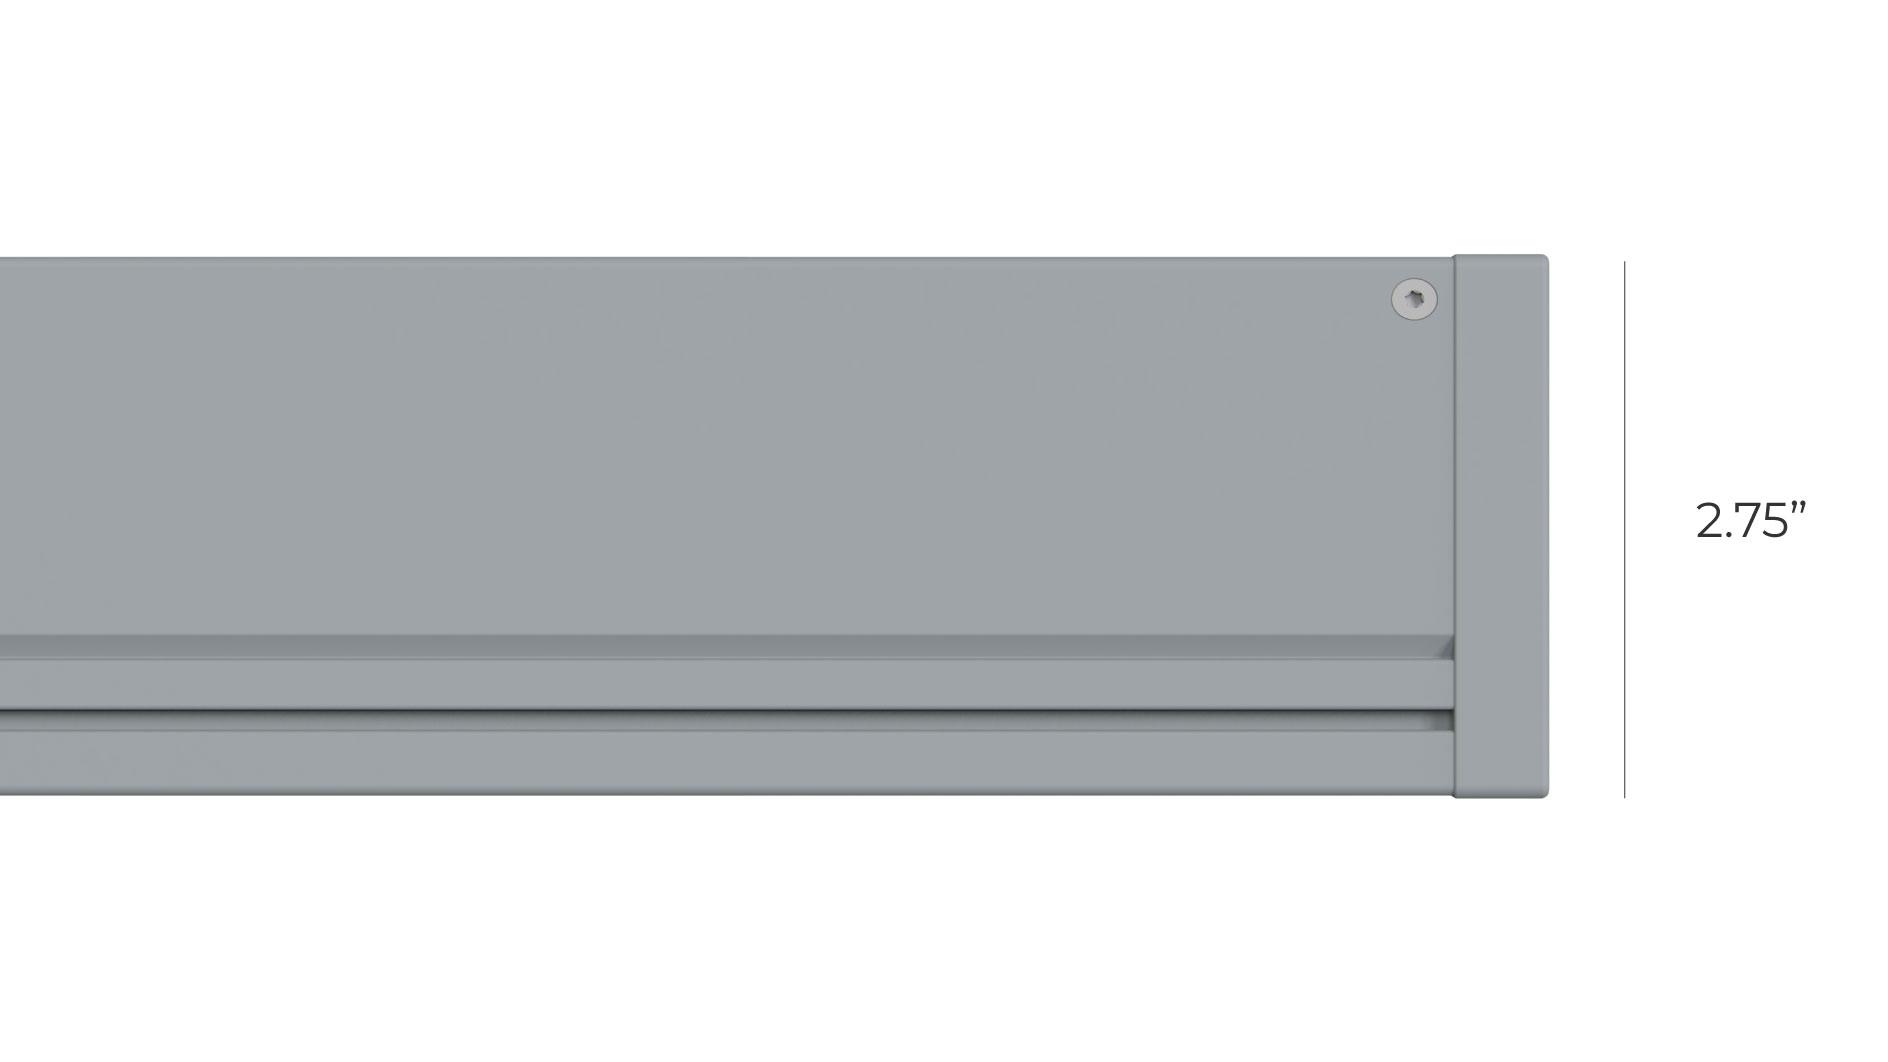 Nano Box Size